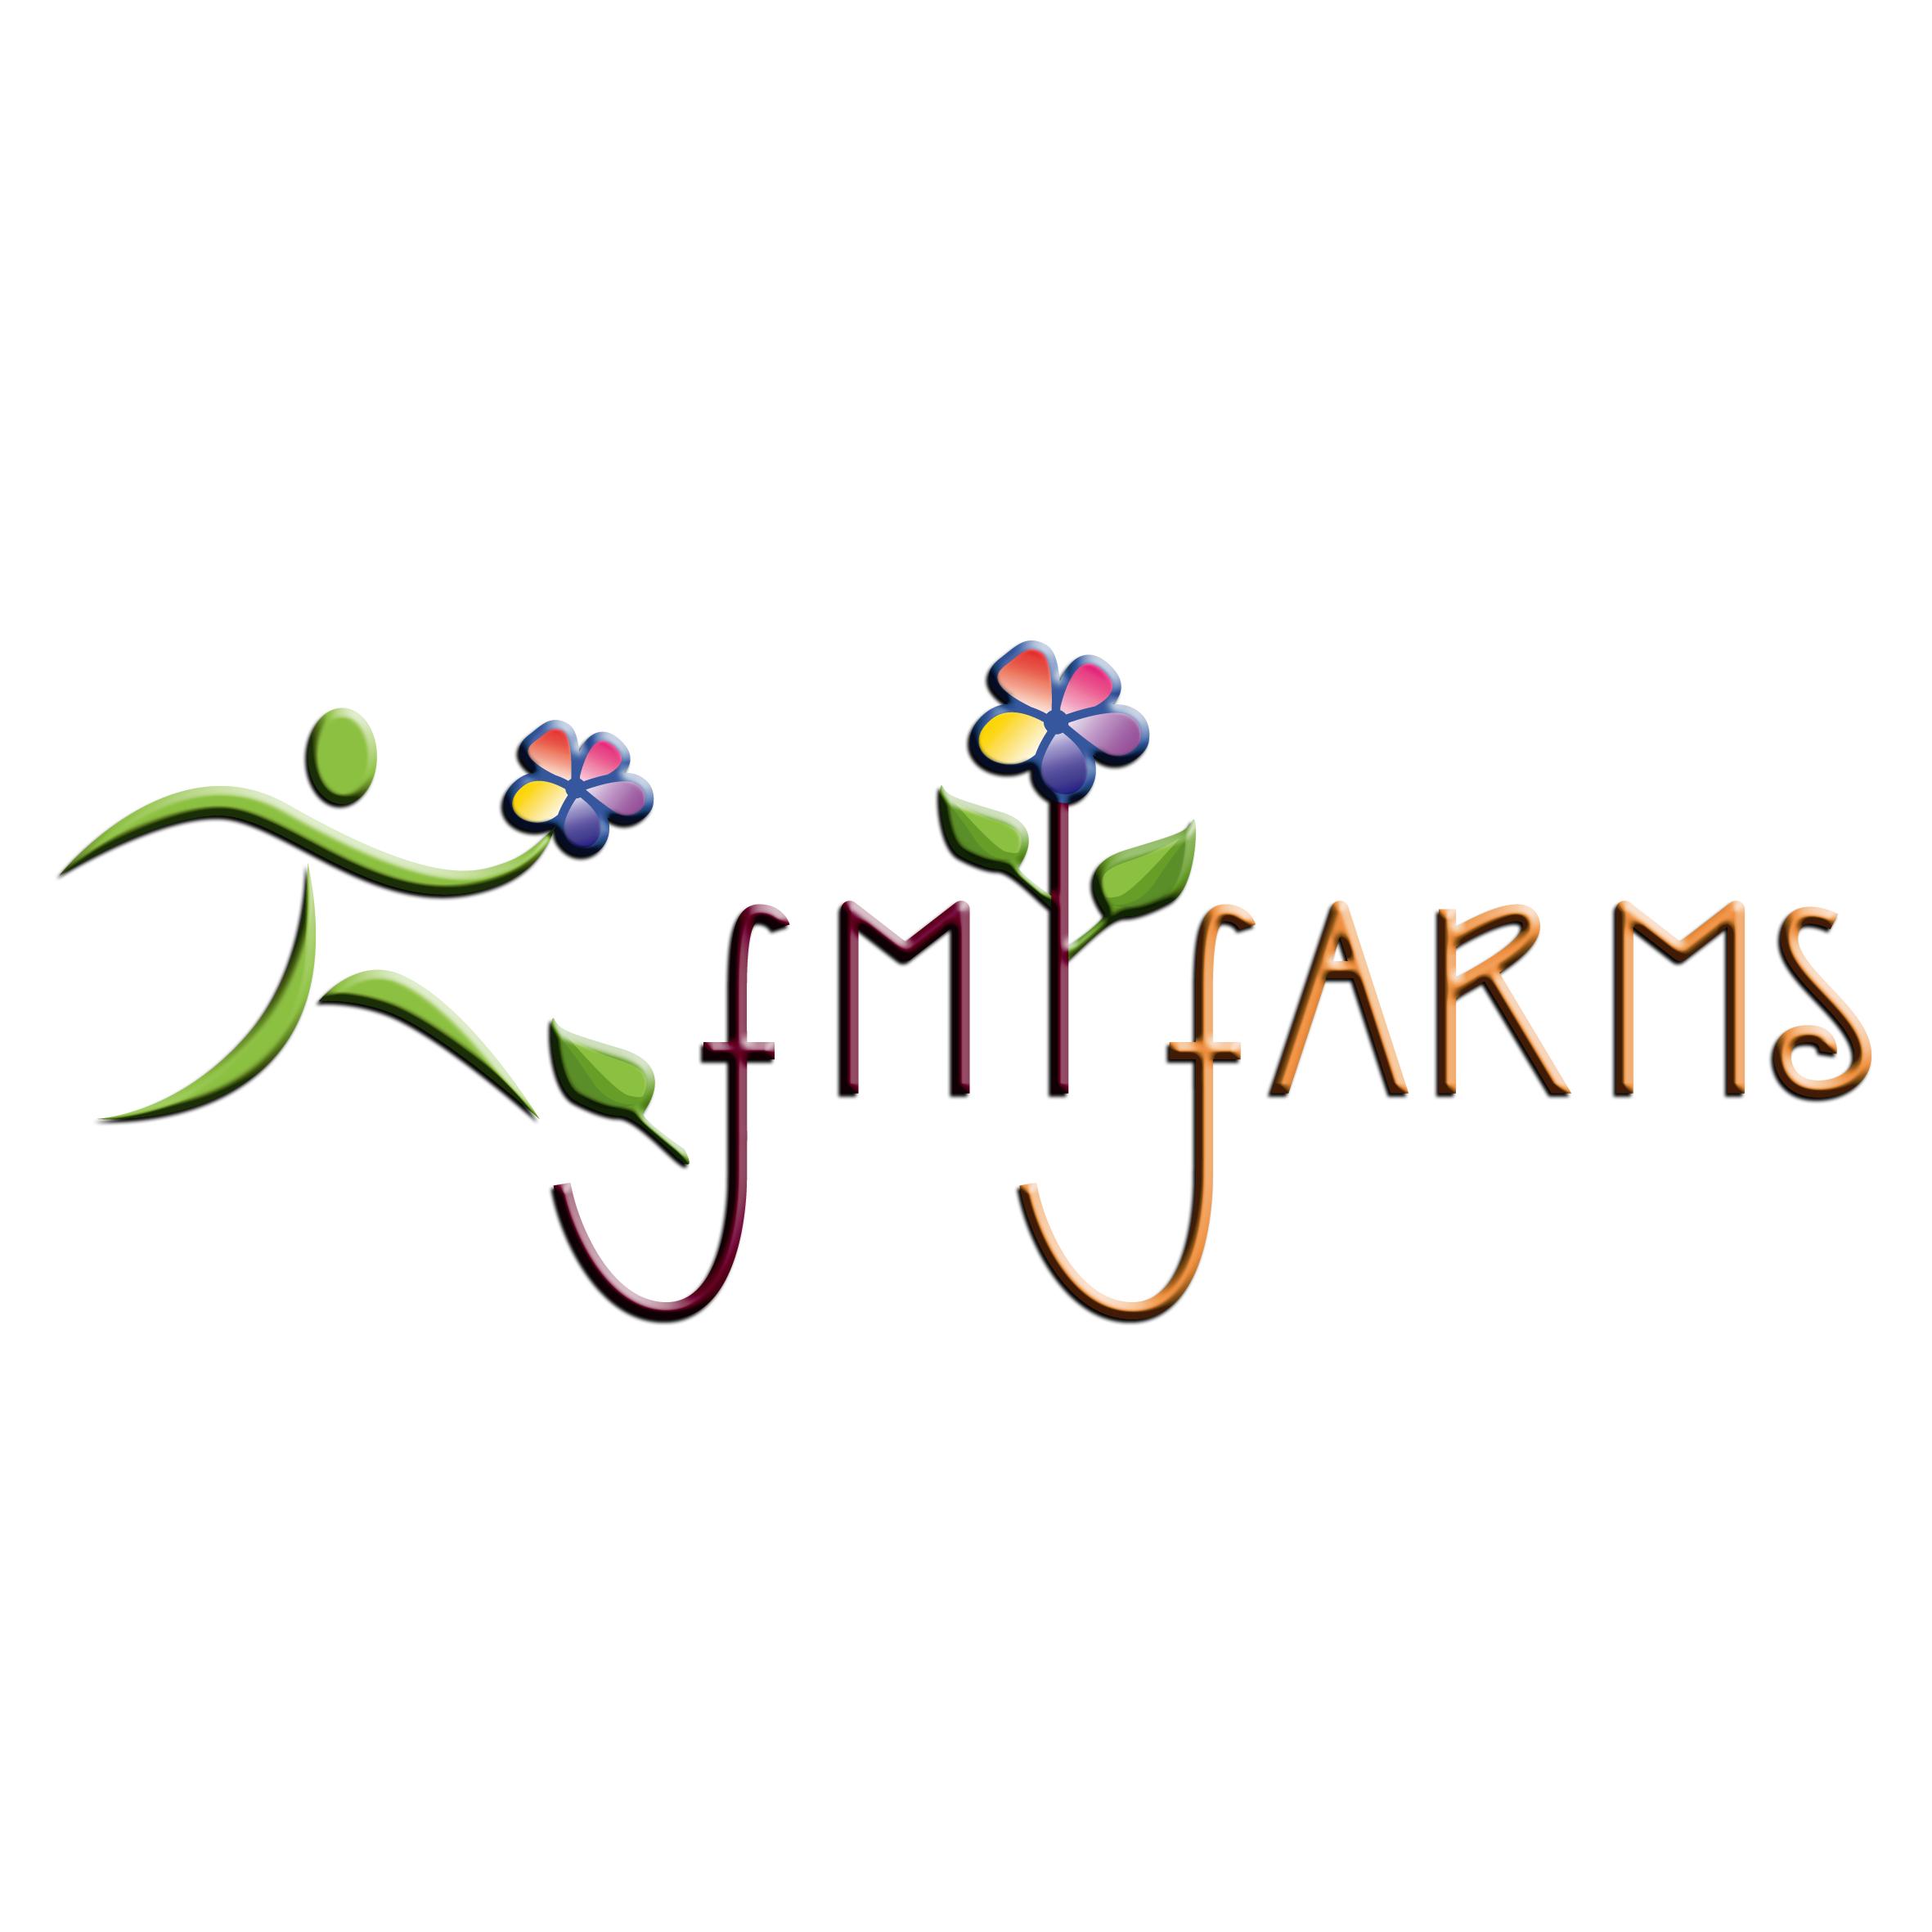 FMI Farms - Flower Wholesaler